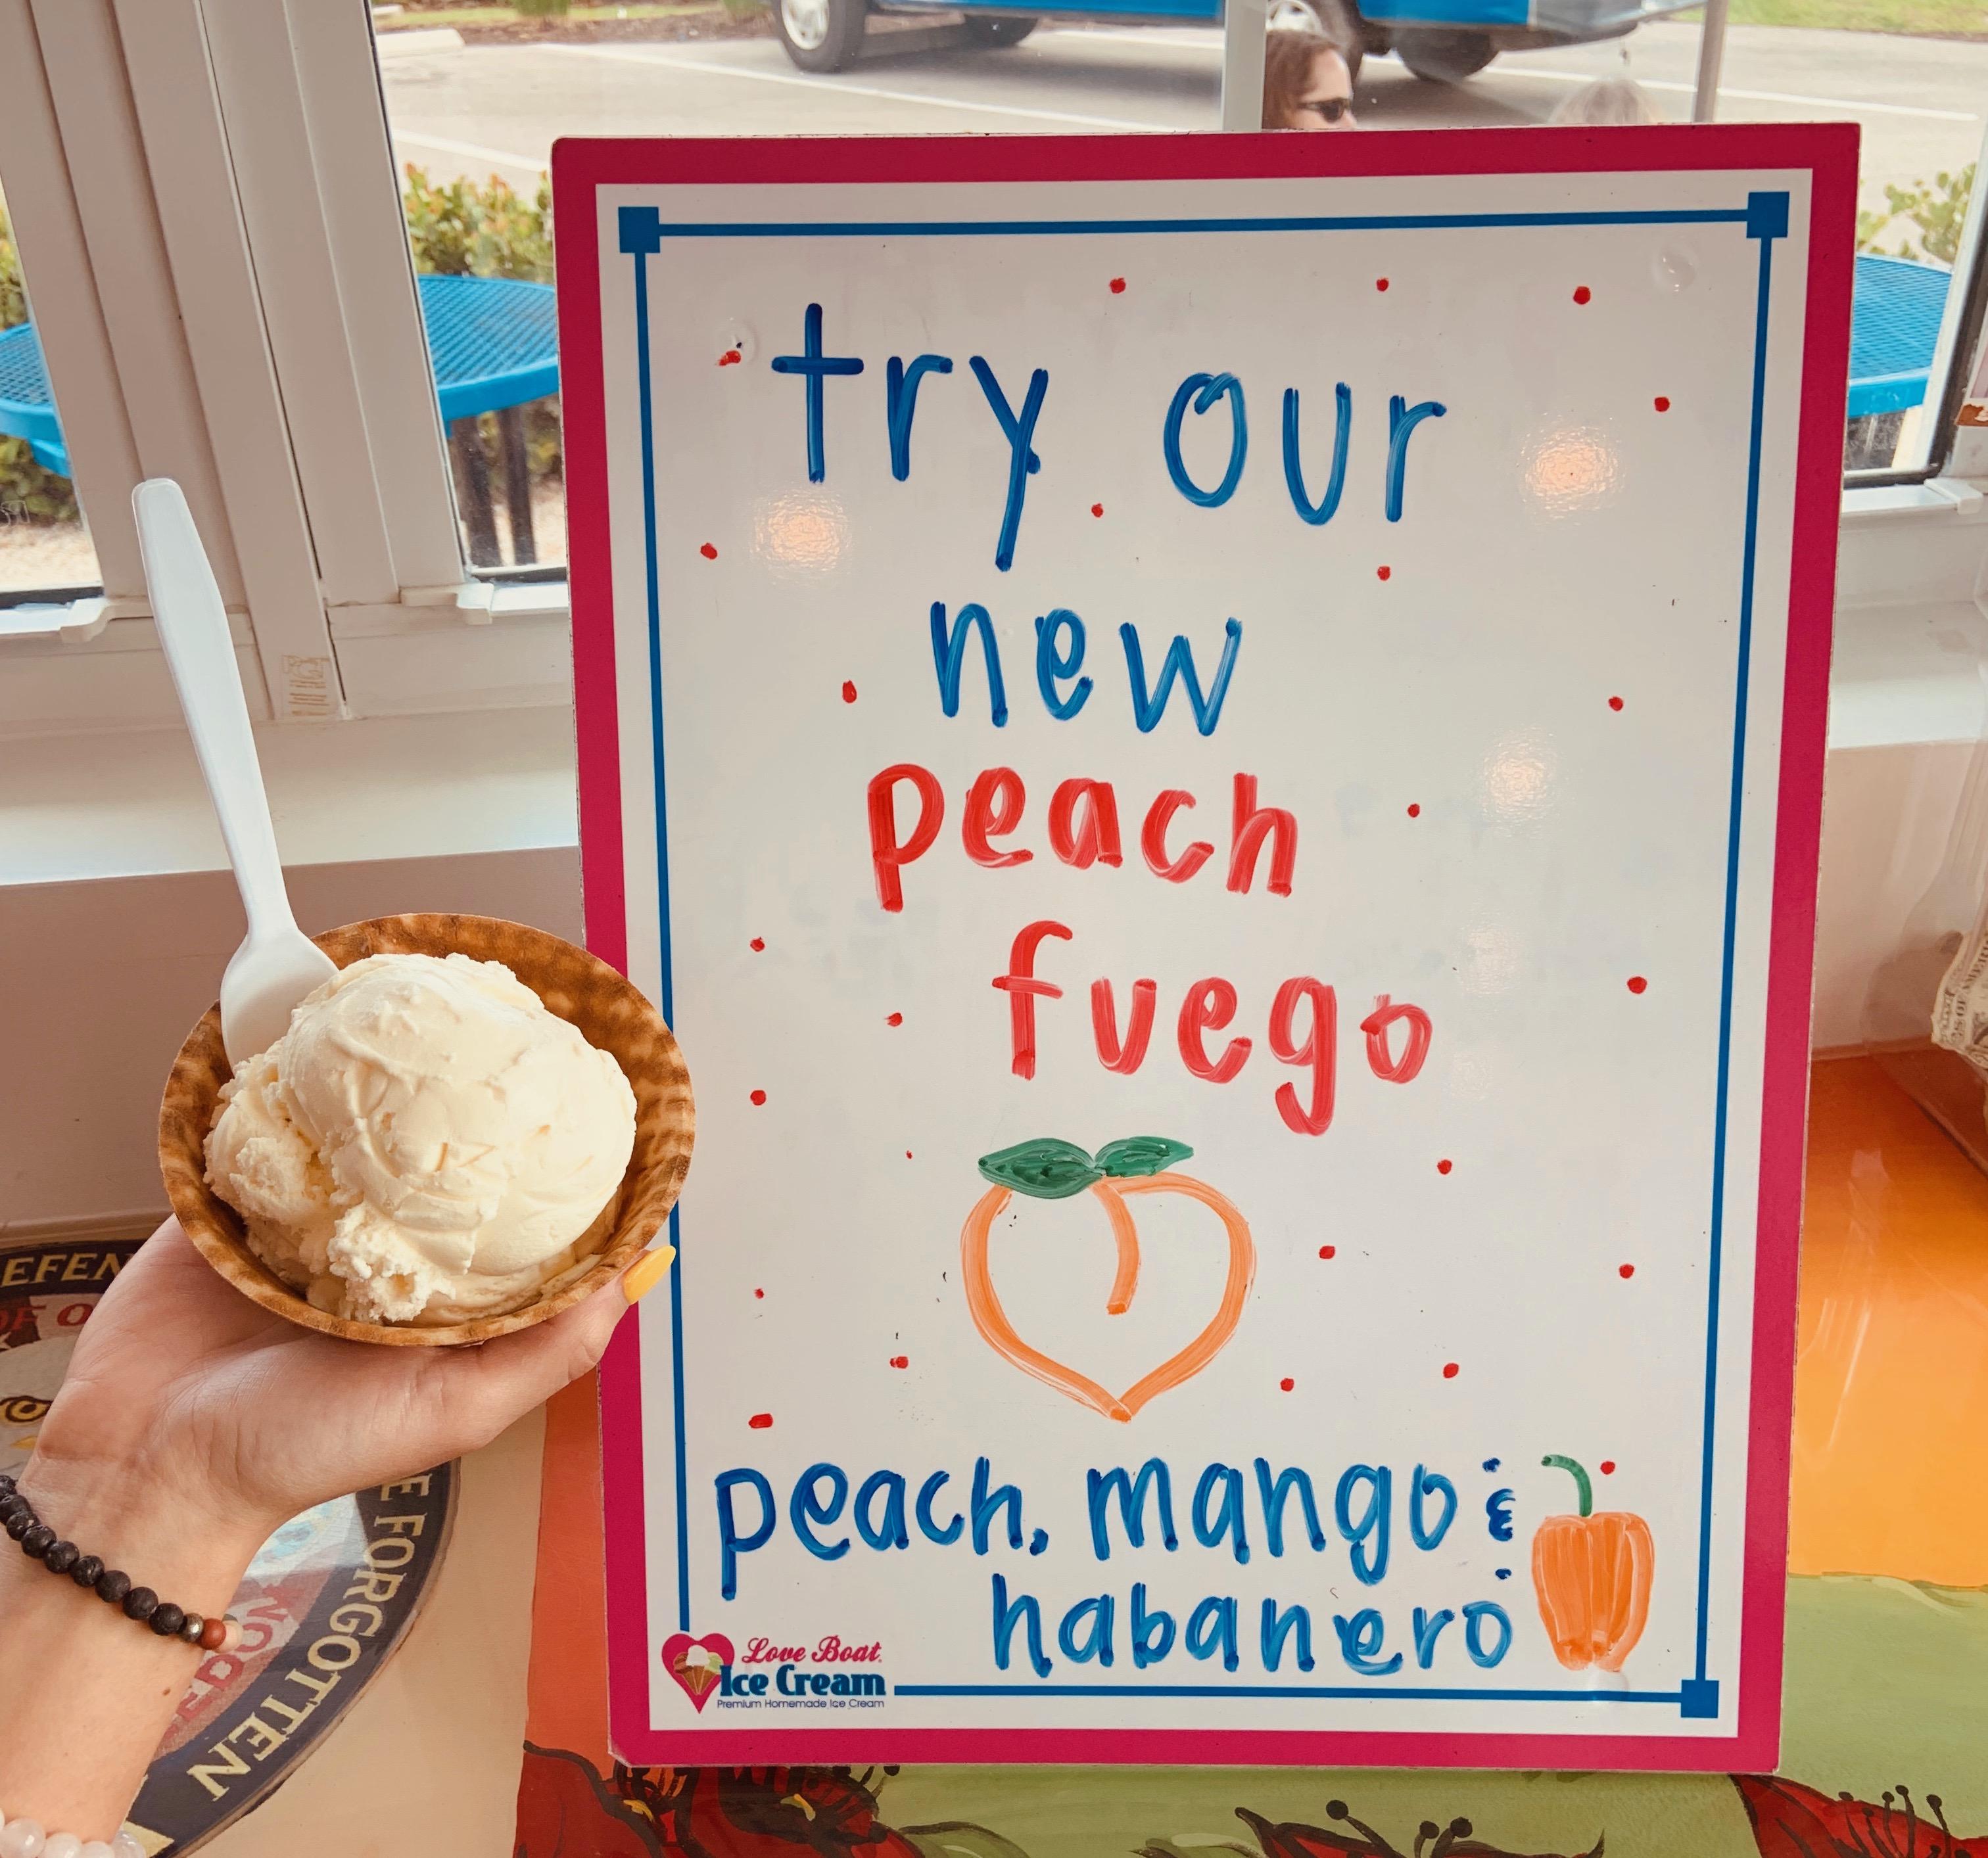 Love Boat Ice Cream Florida